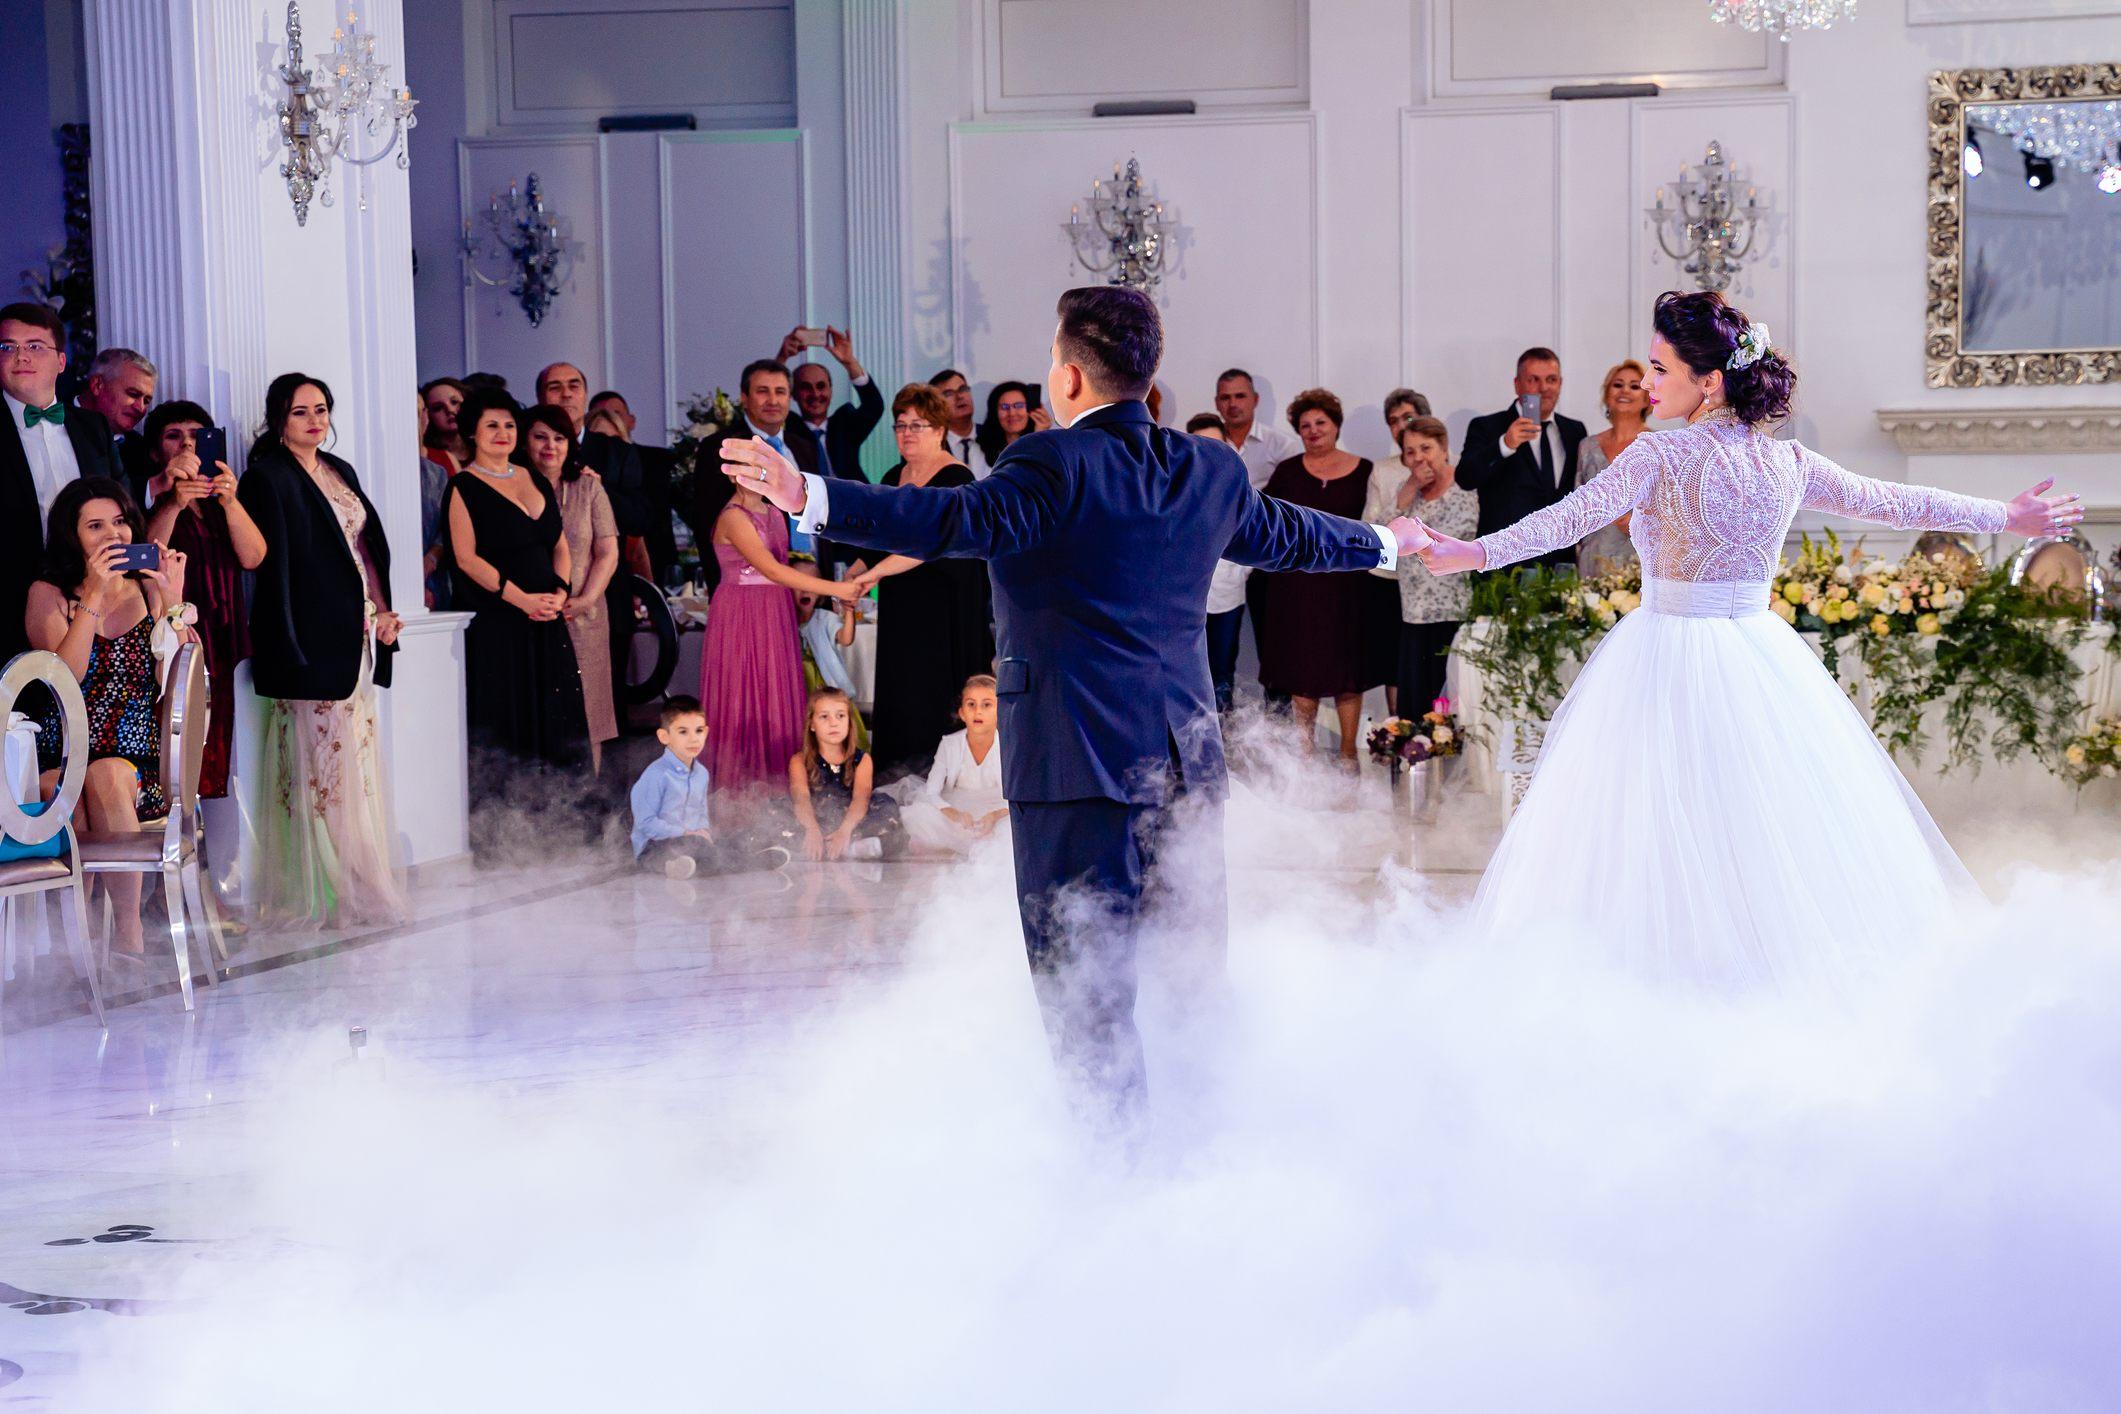 fotograf nunta bucuresti laurentiu nica  24 - Lorena & Matei | Fotografii nunta Bucuresti | Restaurant Domeniul cu Ciresi